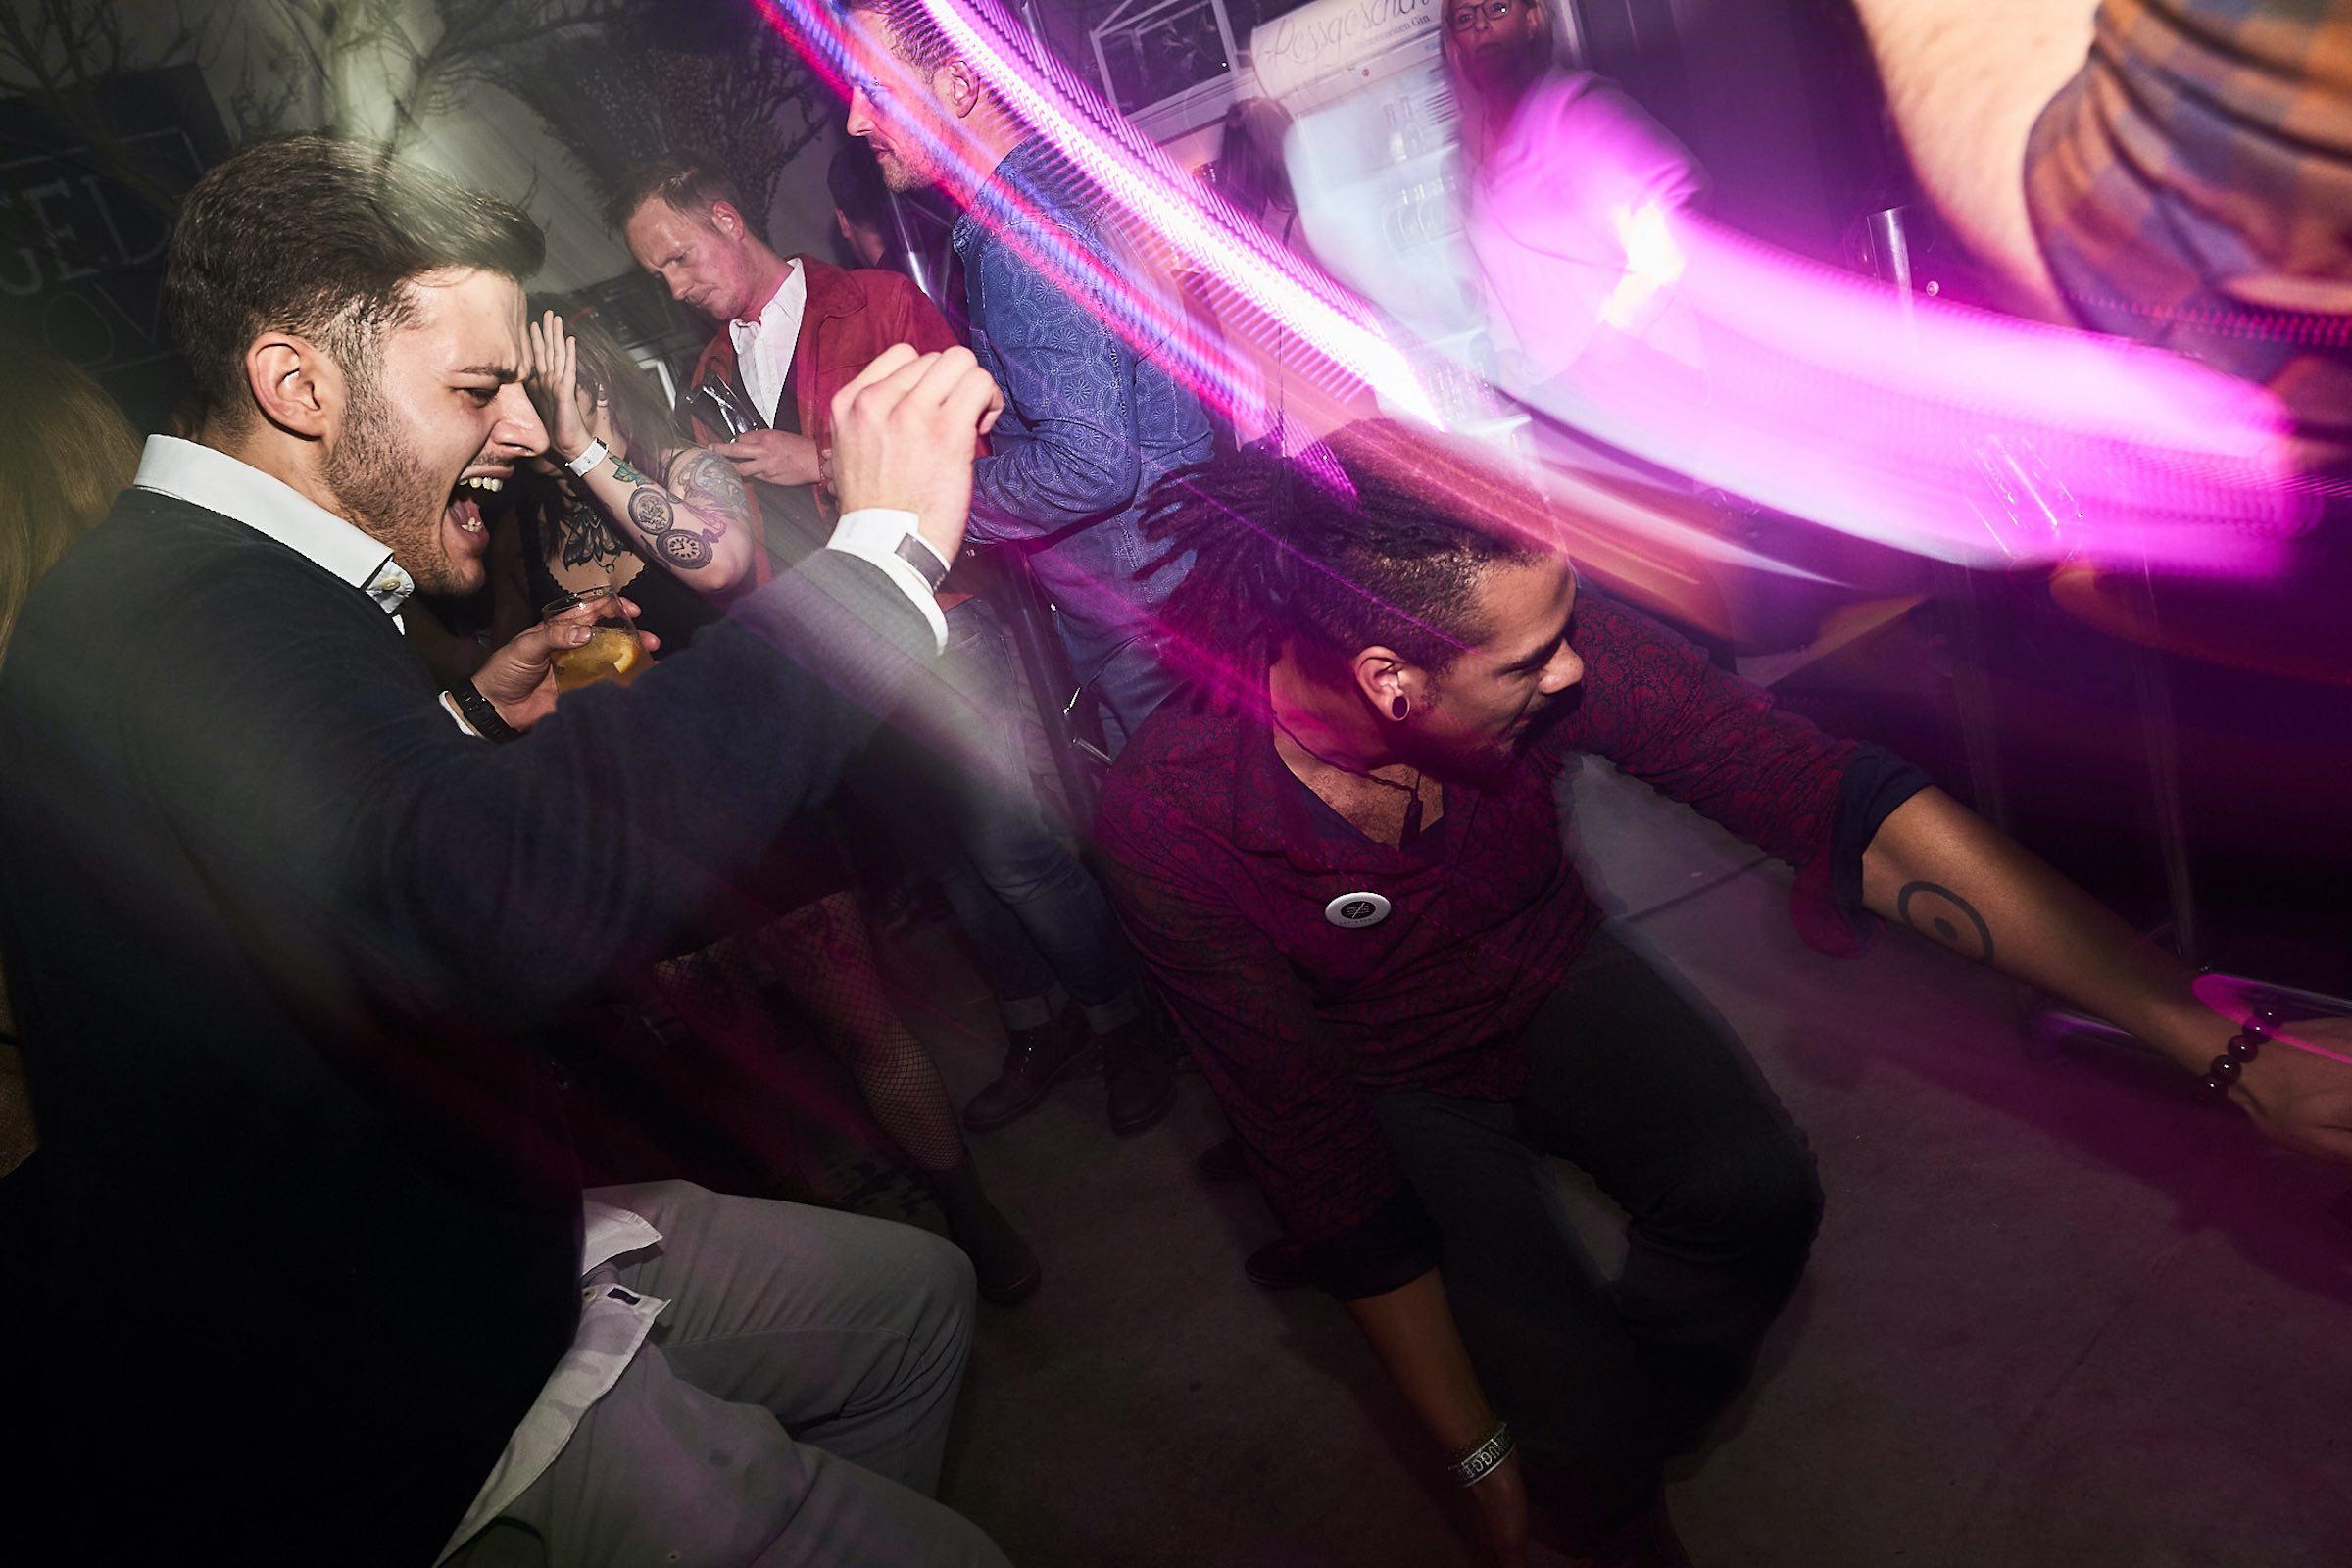 DJ | Hannover | DJ | Braunschweig | DJ | Hameln | DJ | Agentur | DJ | Service | DJ | Messe | DJ | Firmenevent | Firmenfeier | DJ | Weihnachtsfeier | DJ | Sommerfest | DJ | Betriebsfeier | Anfragen | Buchen | Lehmann | Eventservice